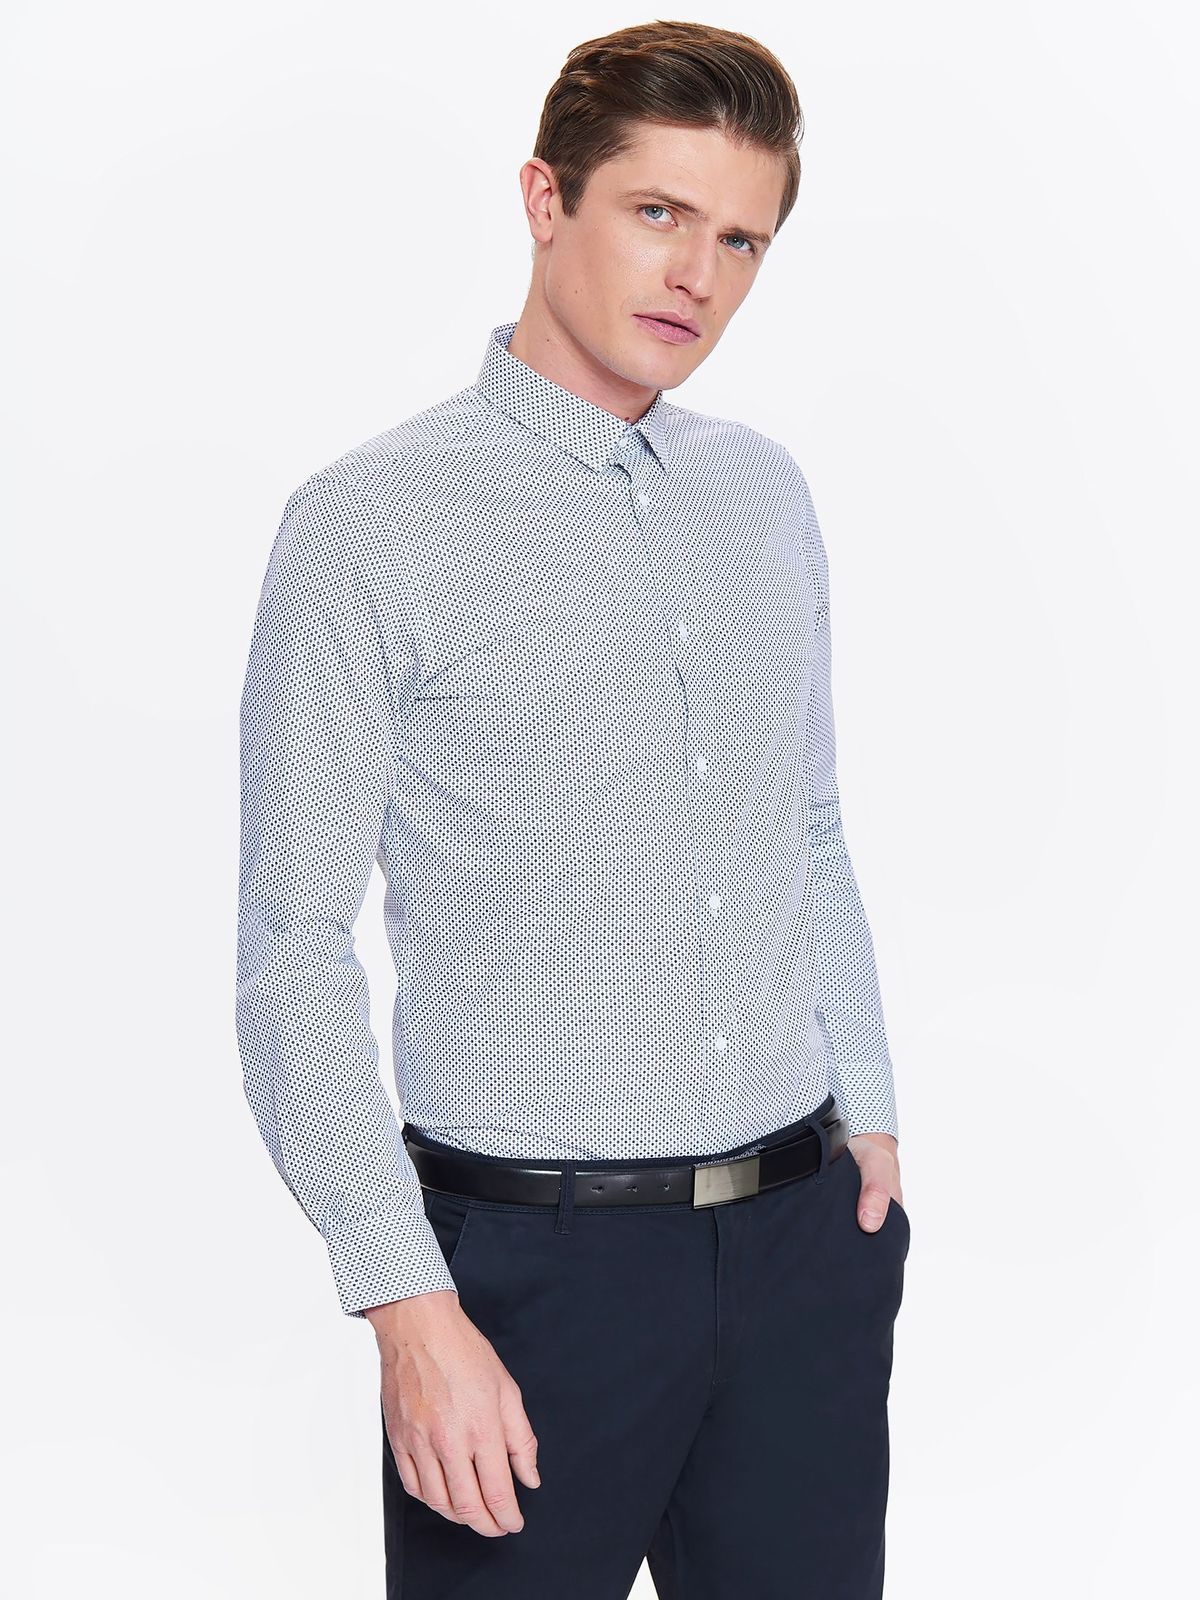 TOP SECRET TOP SECREΤ πουκαμισο slim fit